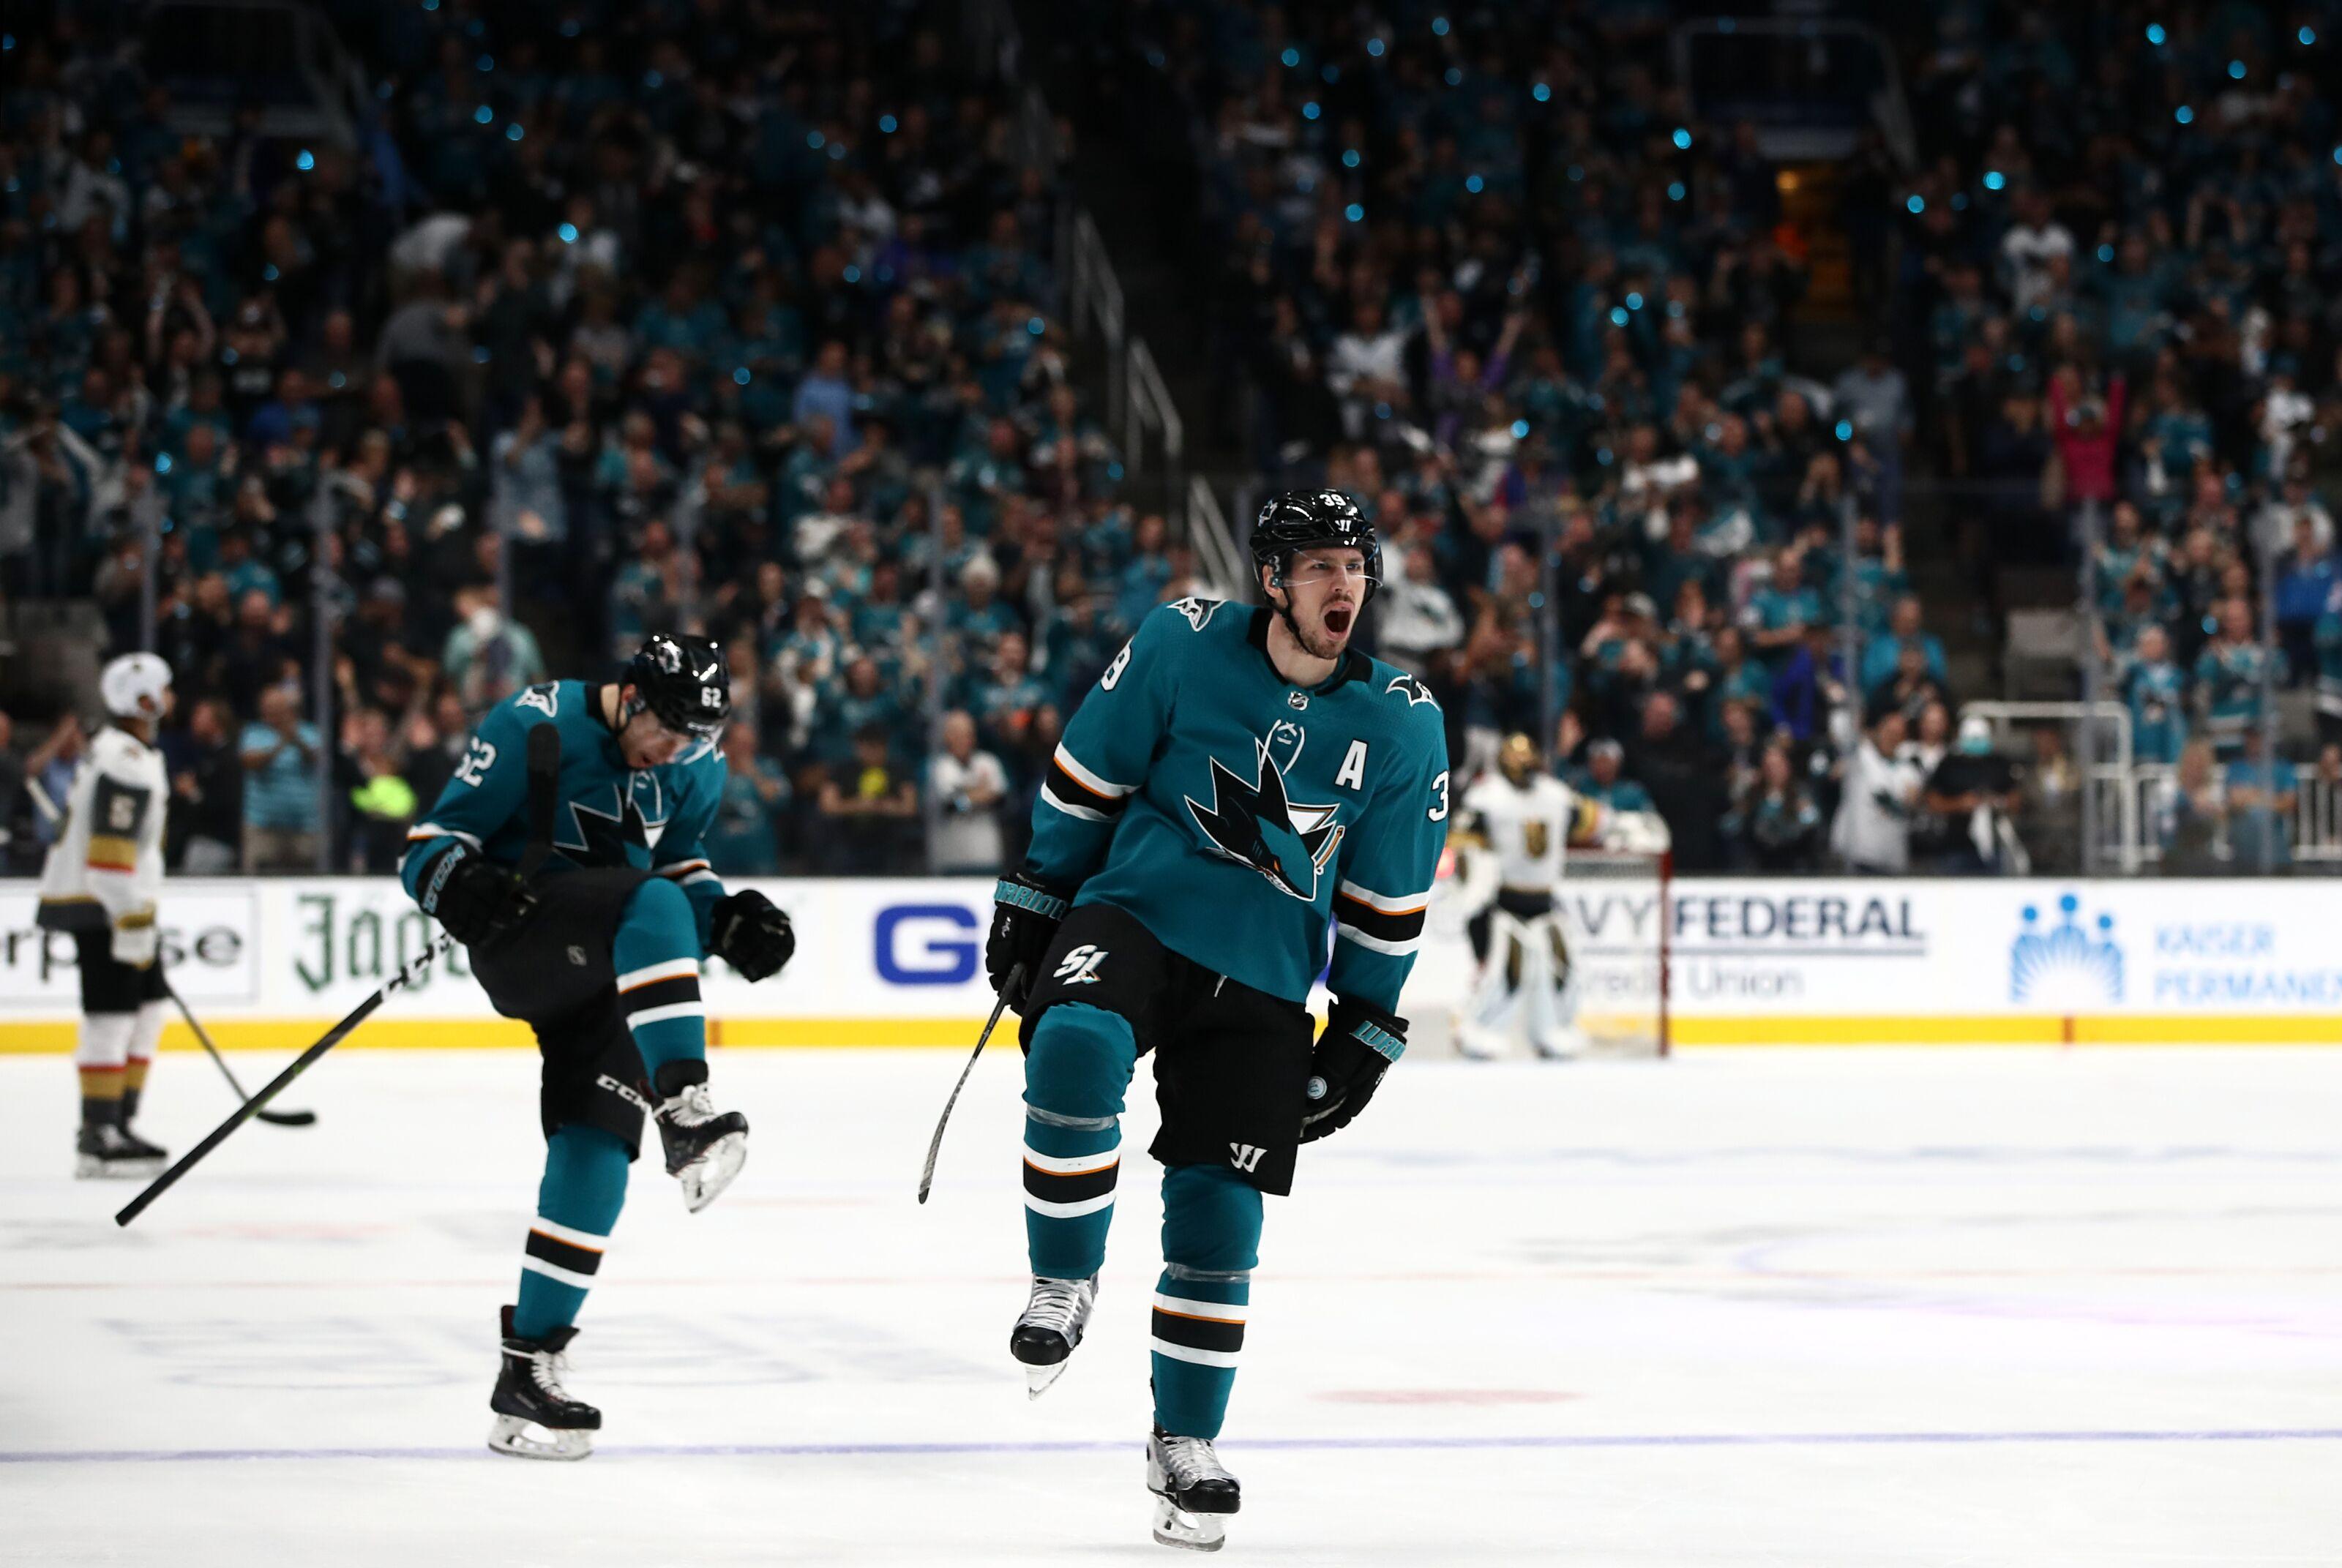 San Jose Sharks: Logan Couture should be the next team's captain